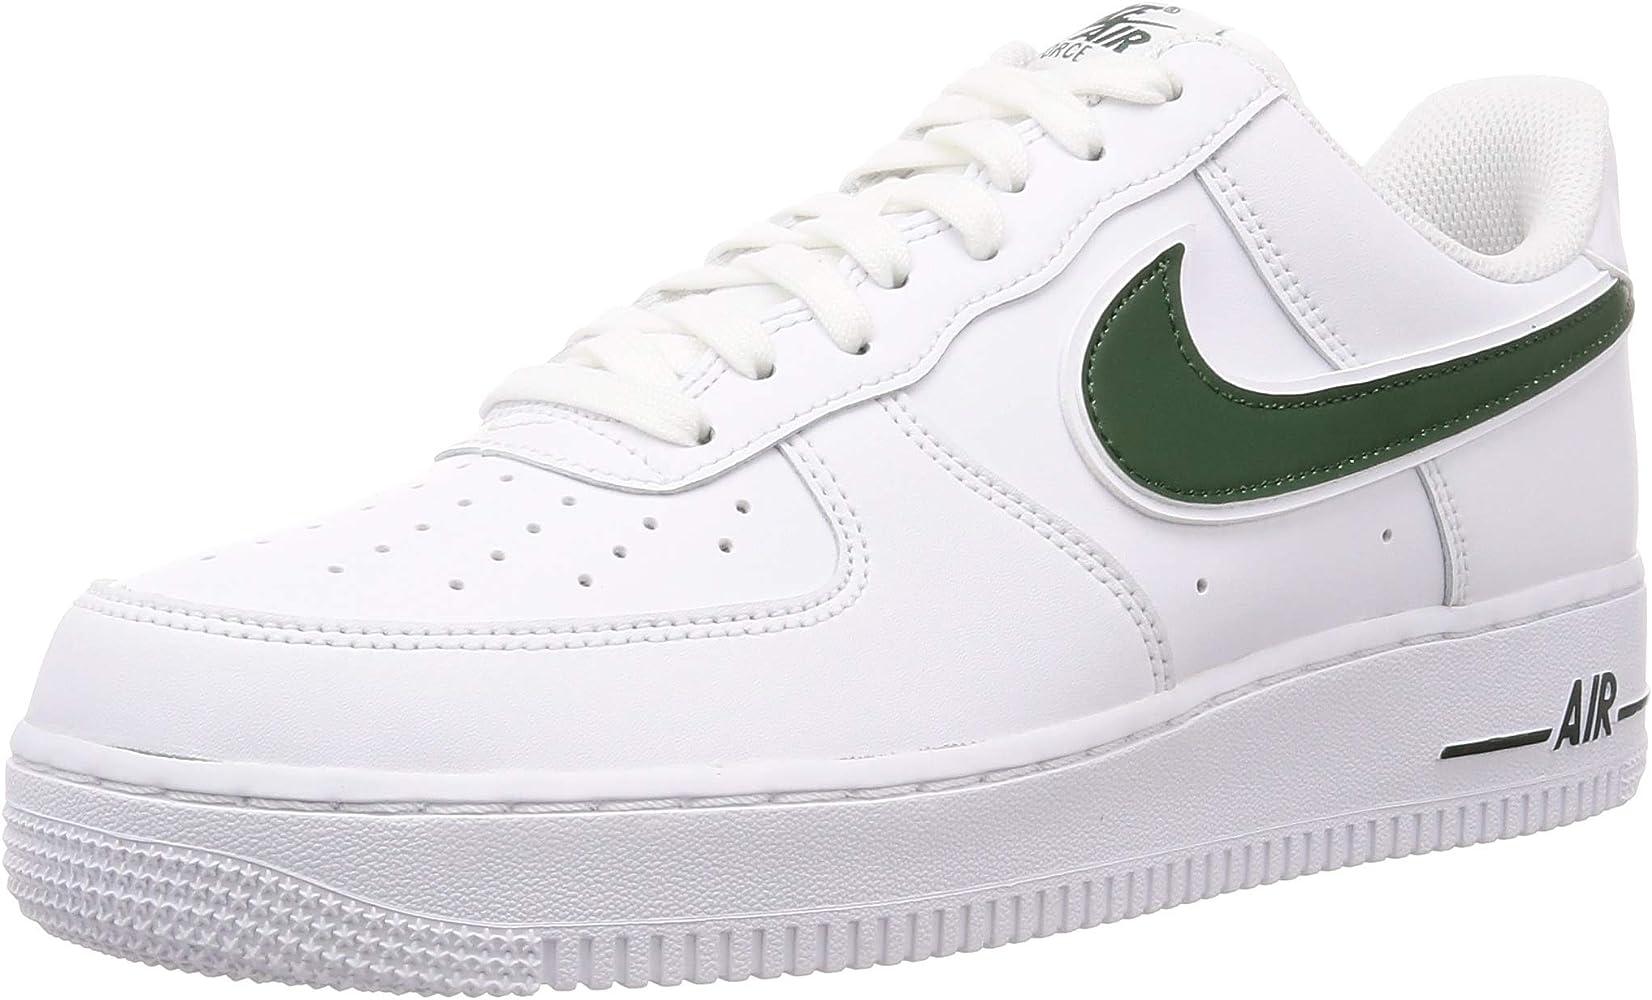 Nike Air Force 1 '07 3, Scarpe da Basket Uomo: Amazon.it